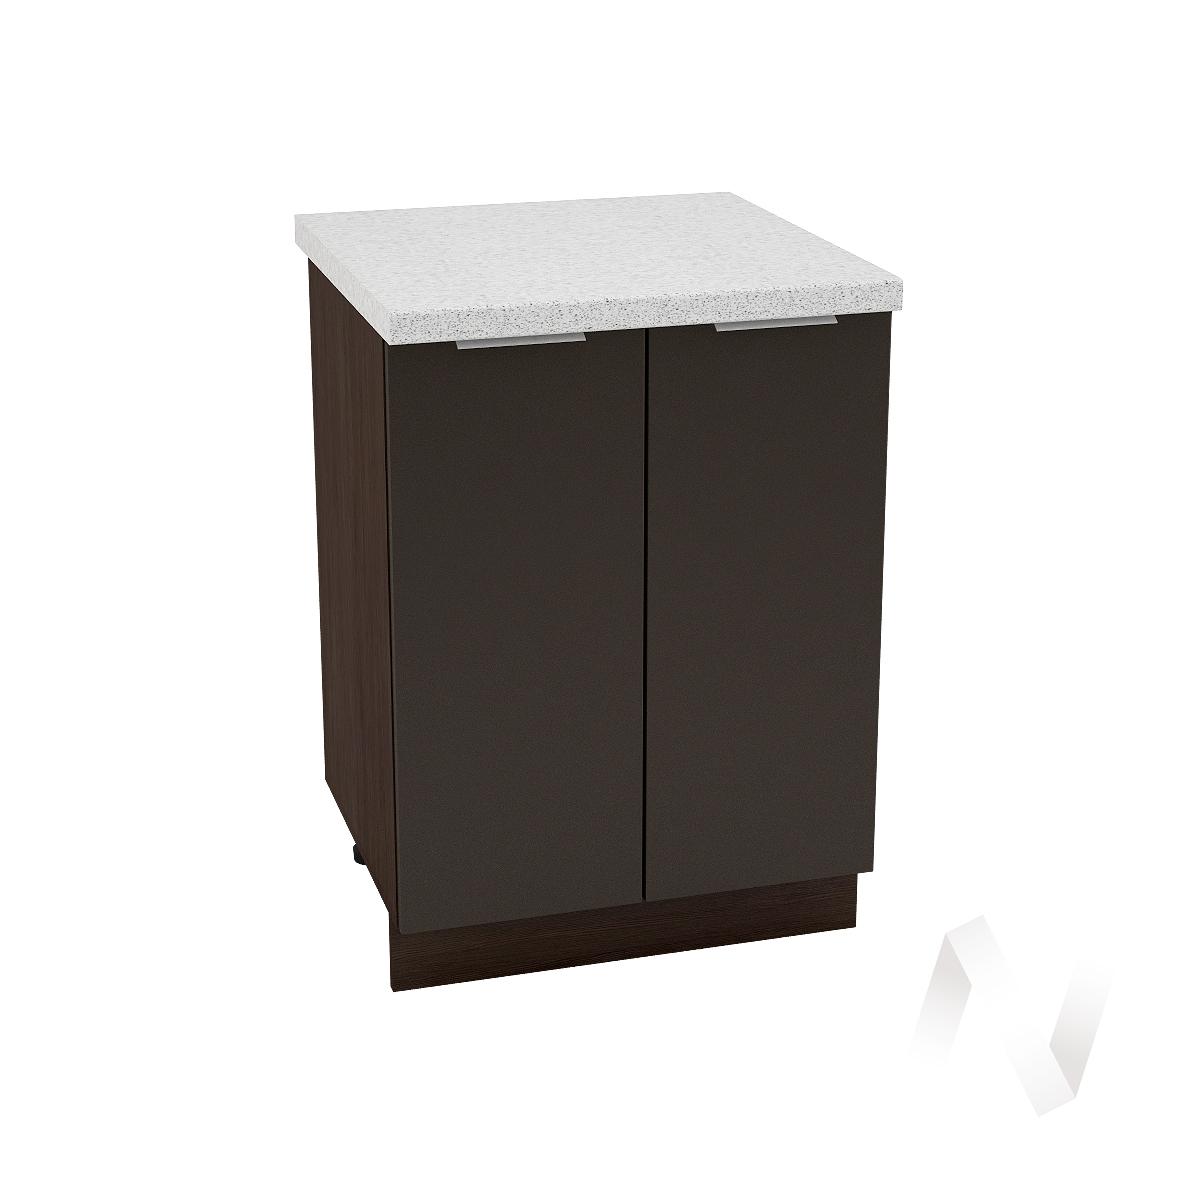 "Кухня ""Терра"": Шкаф нижний 600, ШН 600 (смоки софт/корпус венге)"